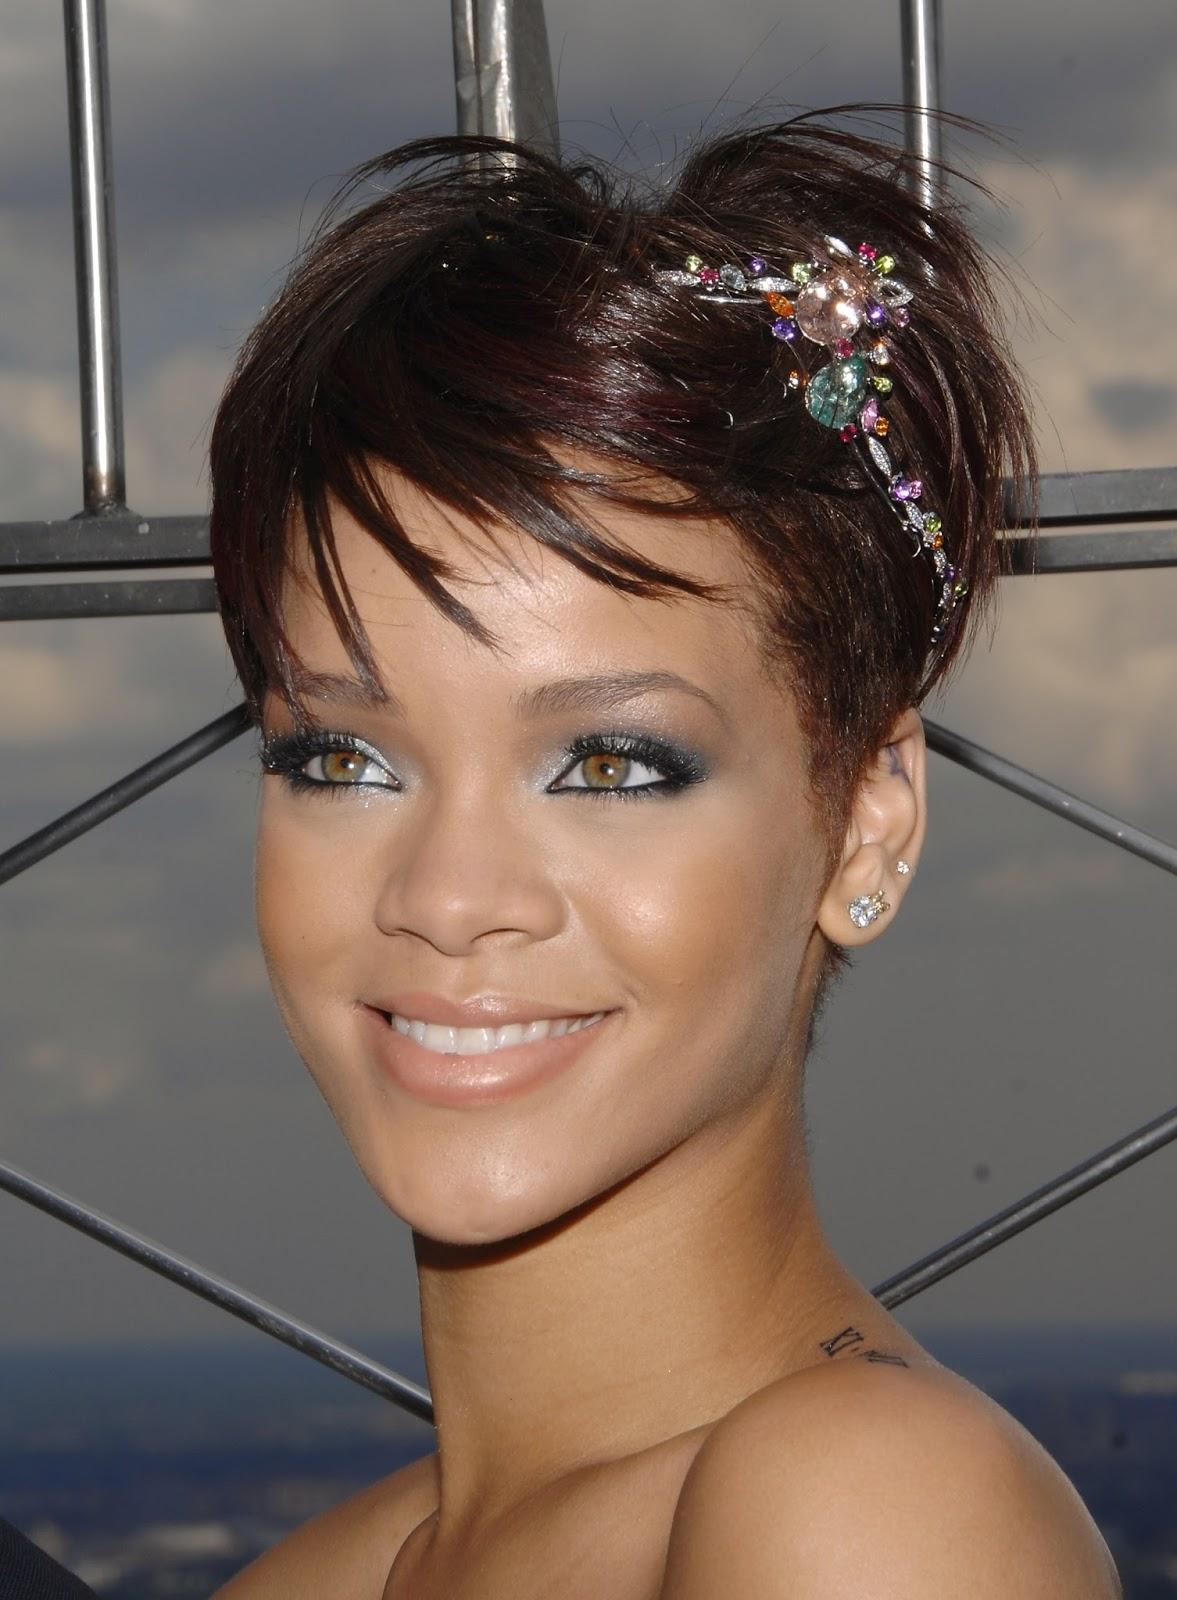 Peinados Rihanna Pelo Corto - Melenas XXS peinados para pelo corto Enfemenino